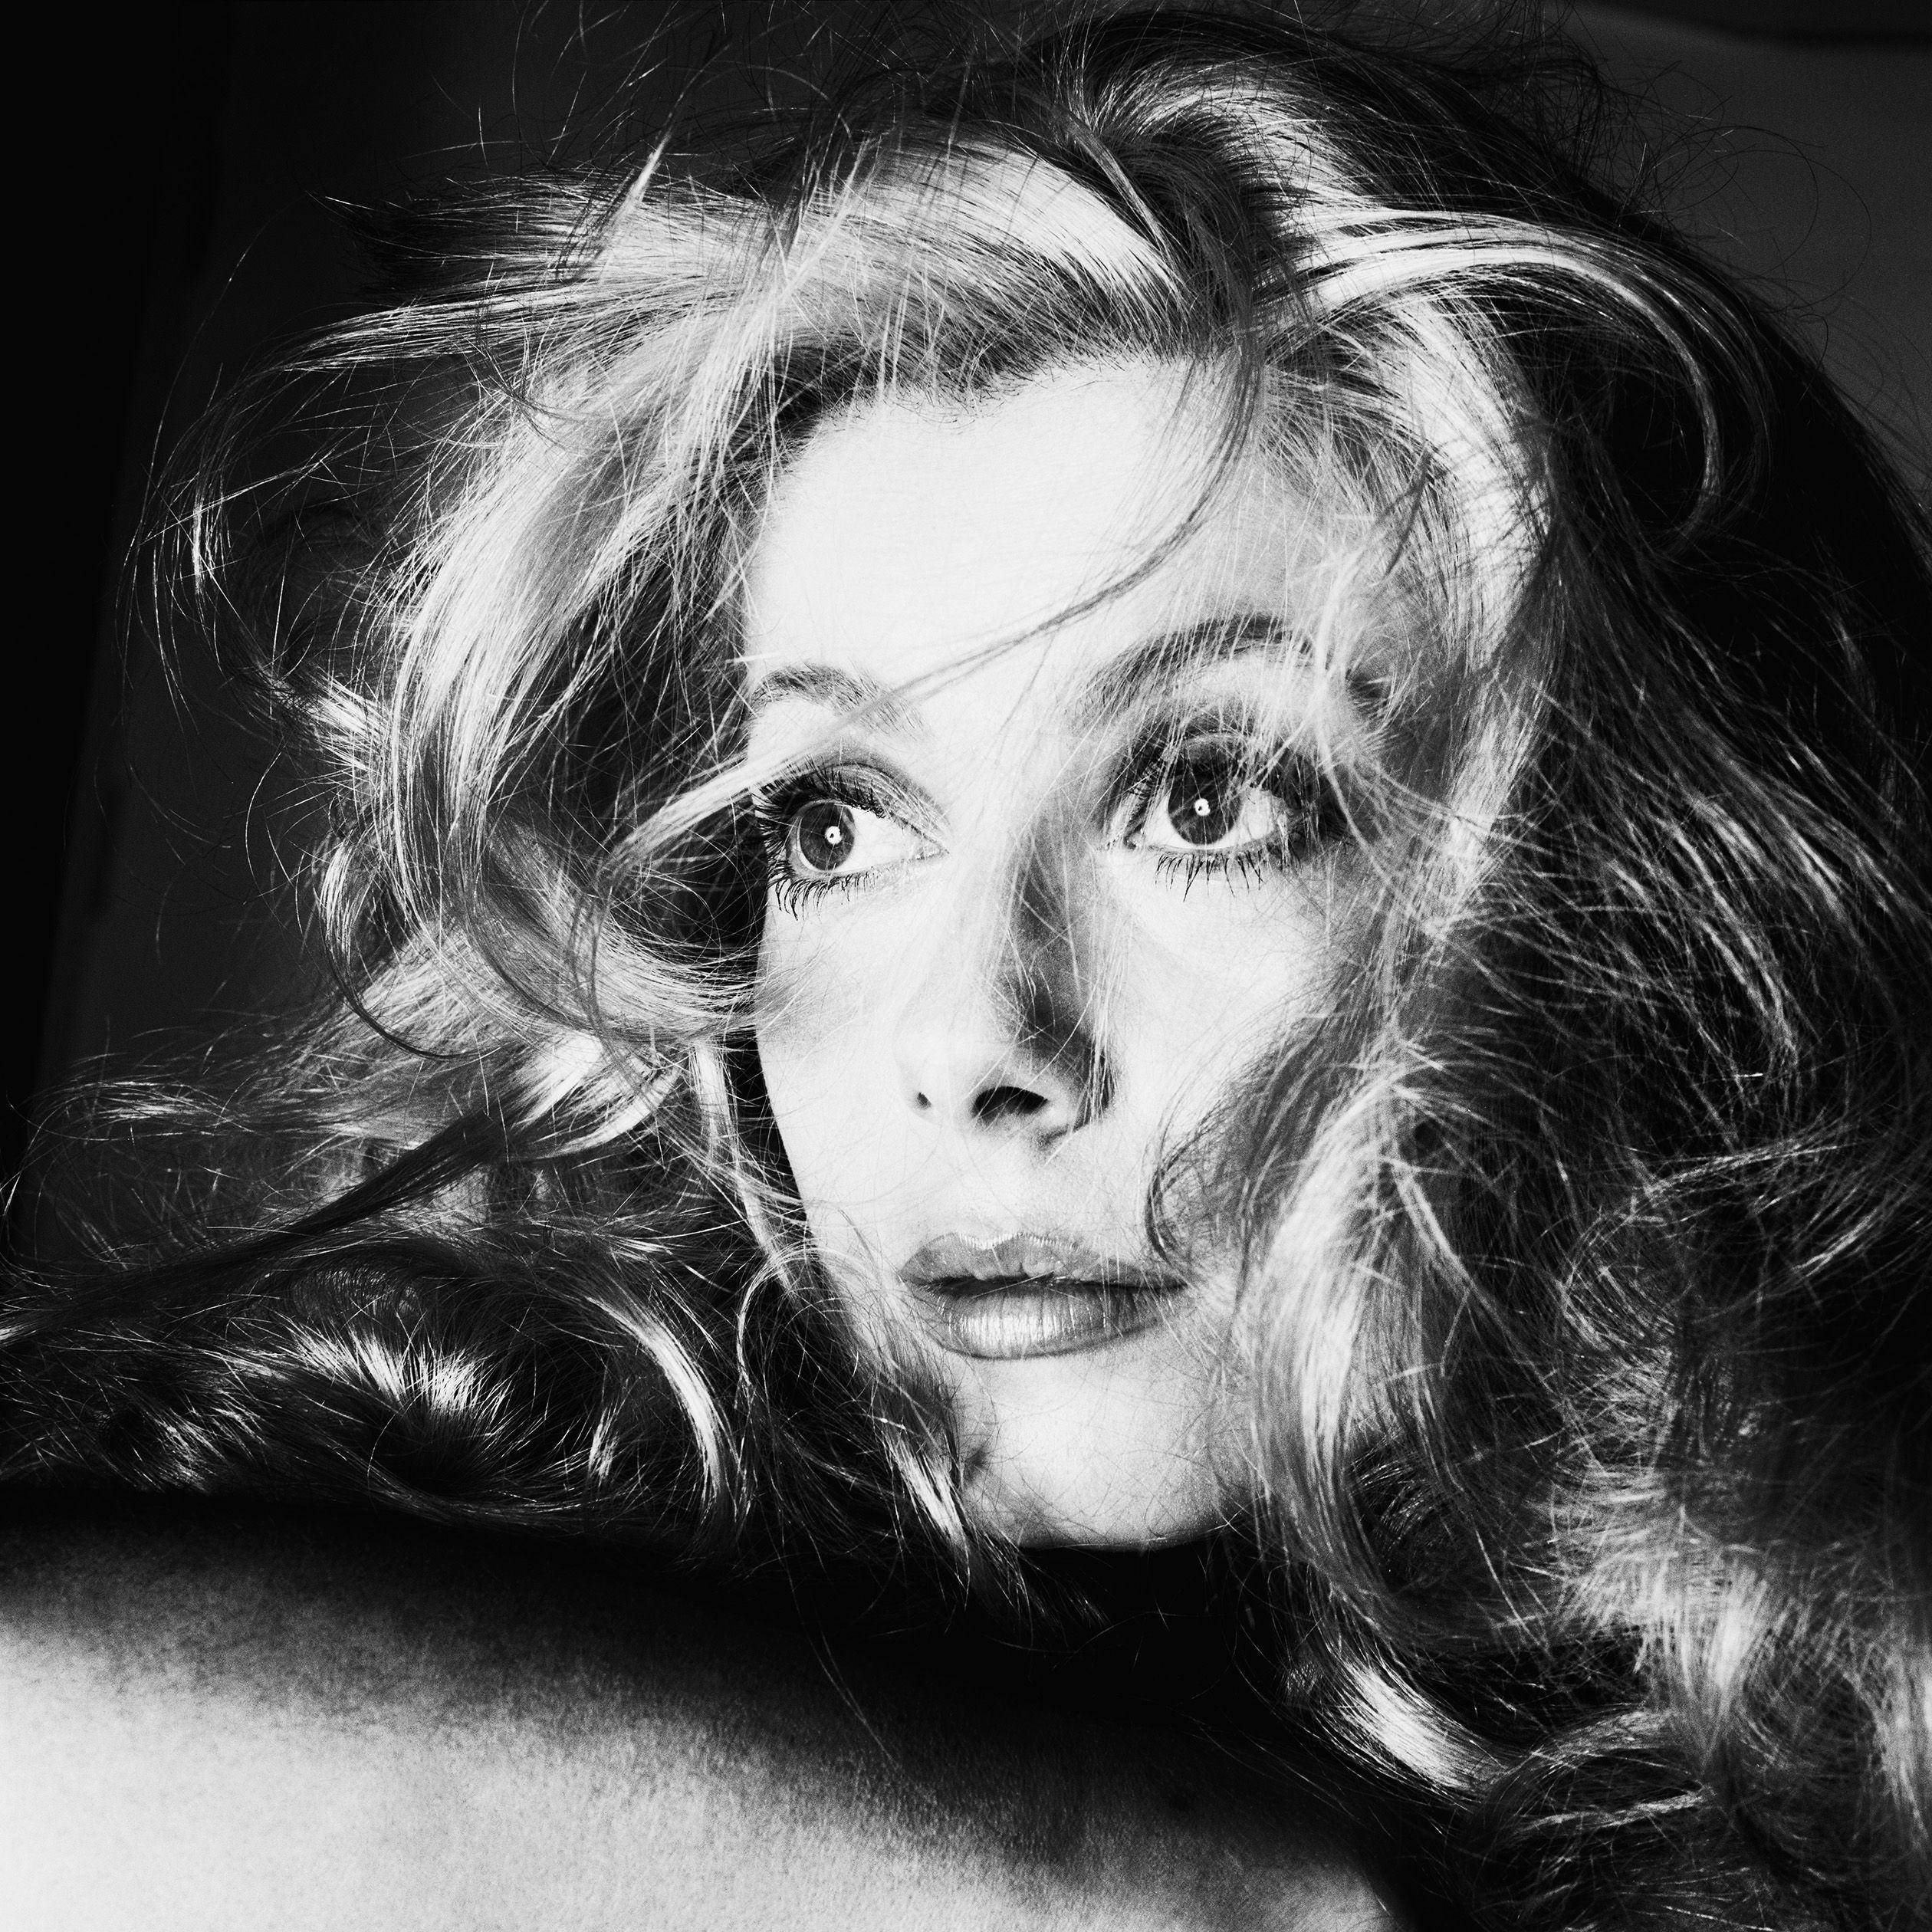 <p>Catherine Deneuve, actress, Los Angeles, September 22, 1968</p>